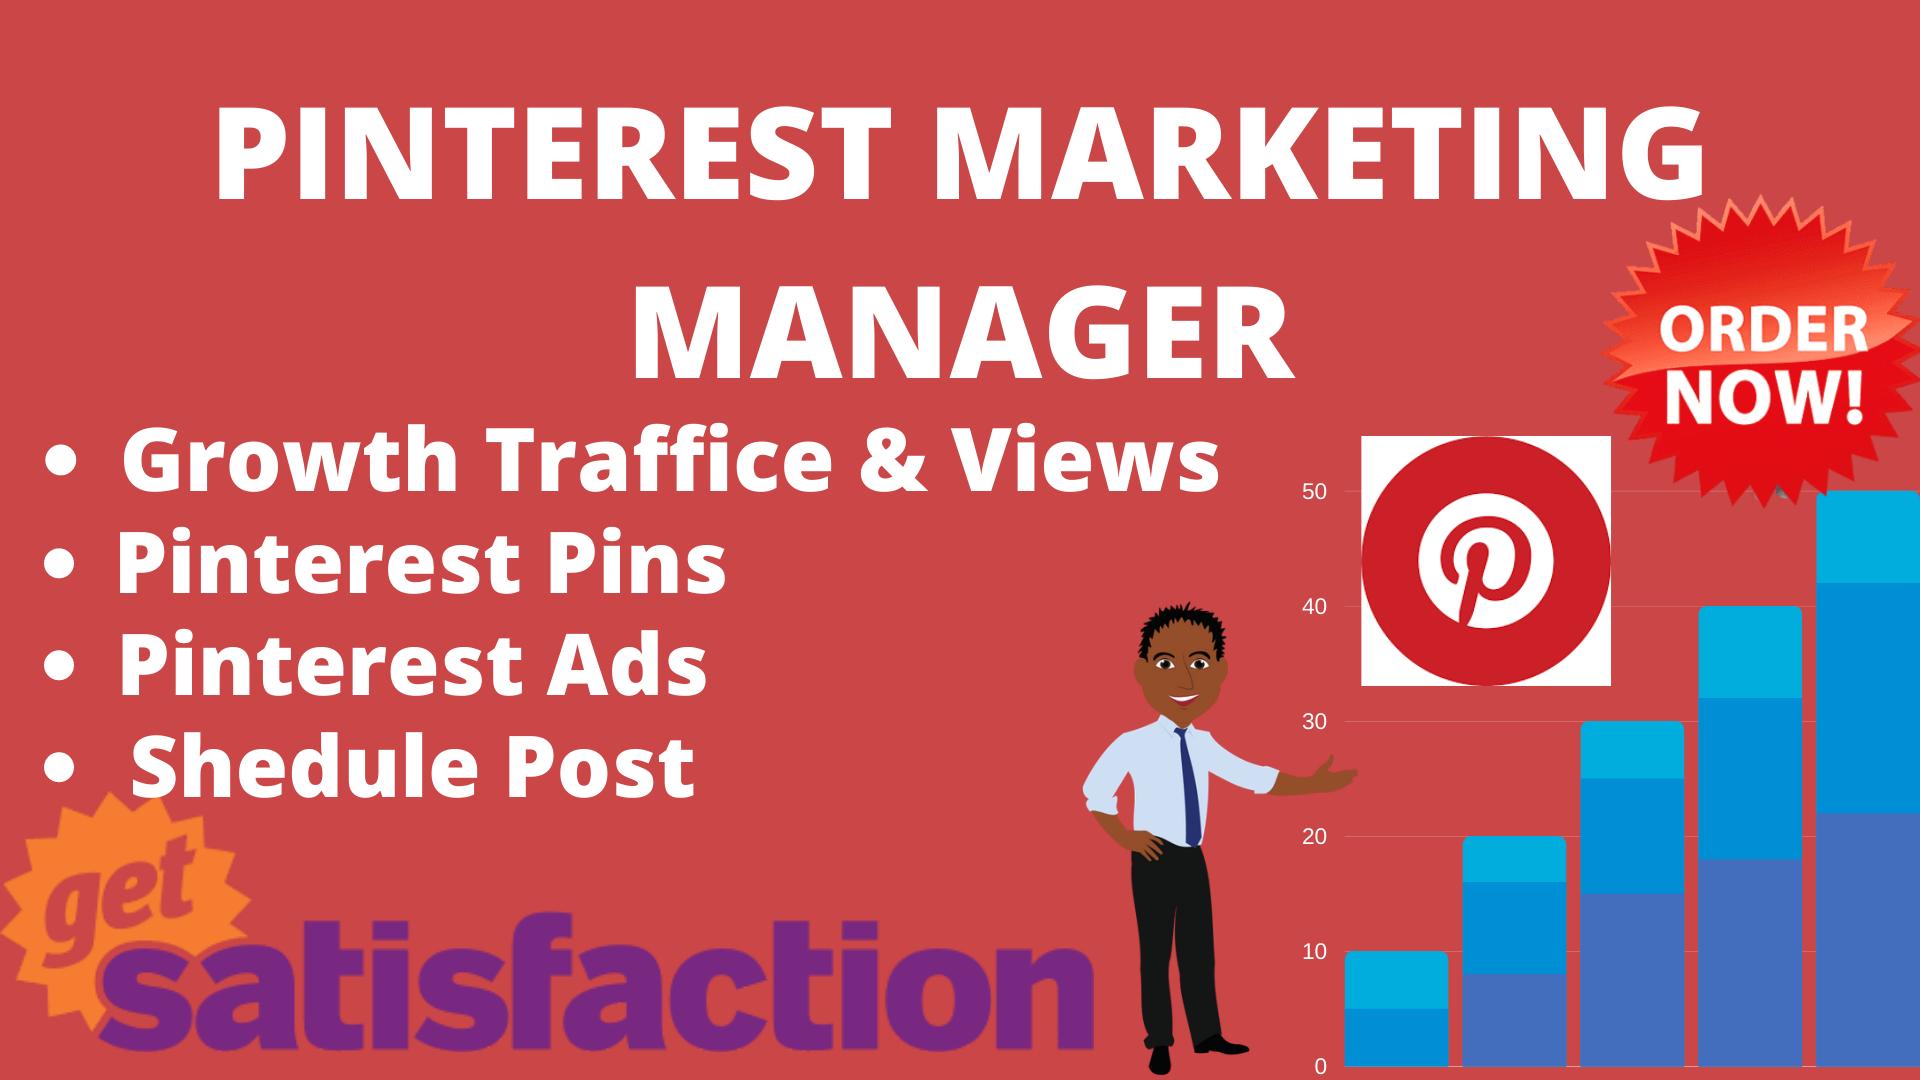 40 Real Pinterest Repin Social Signals SEO Ranking 2020 for 2